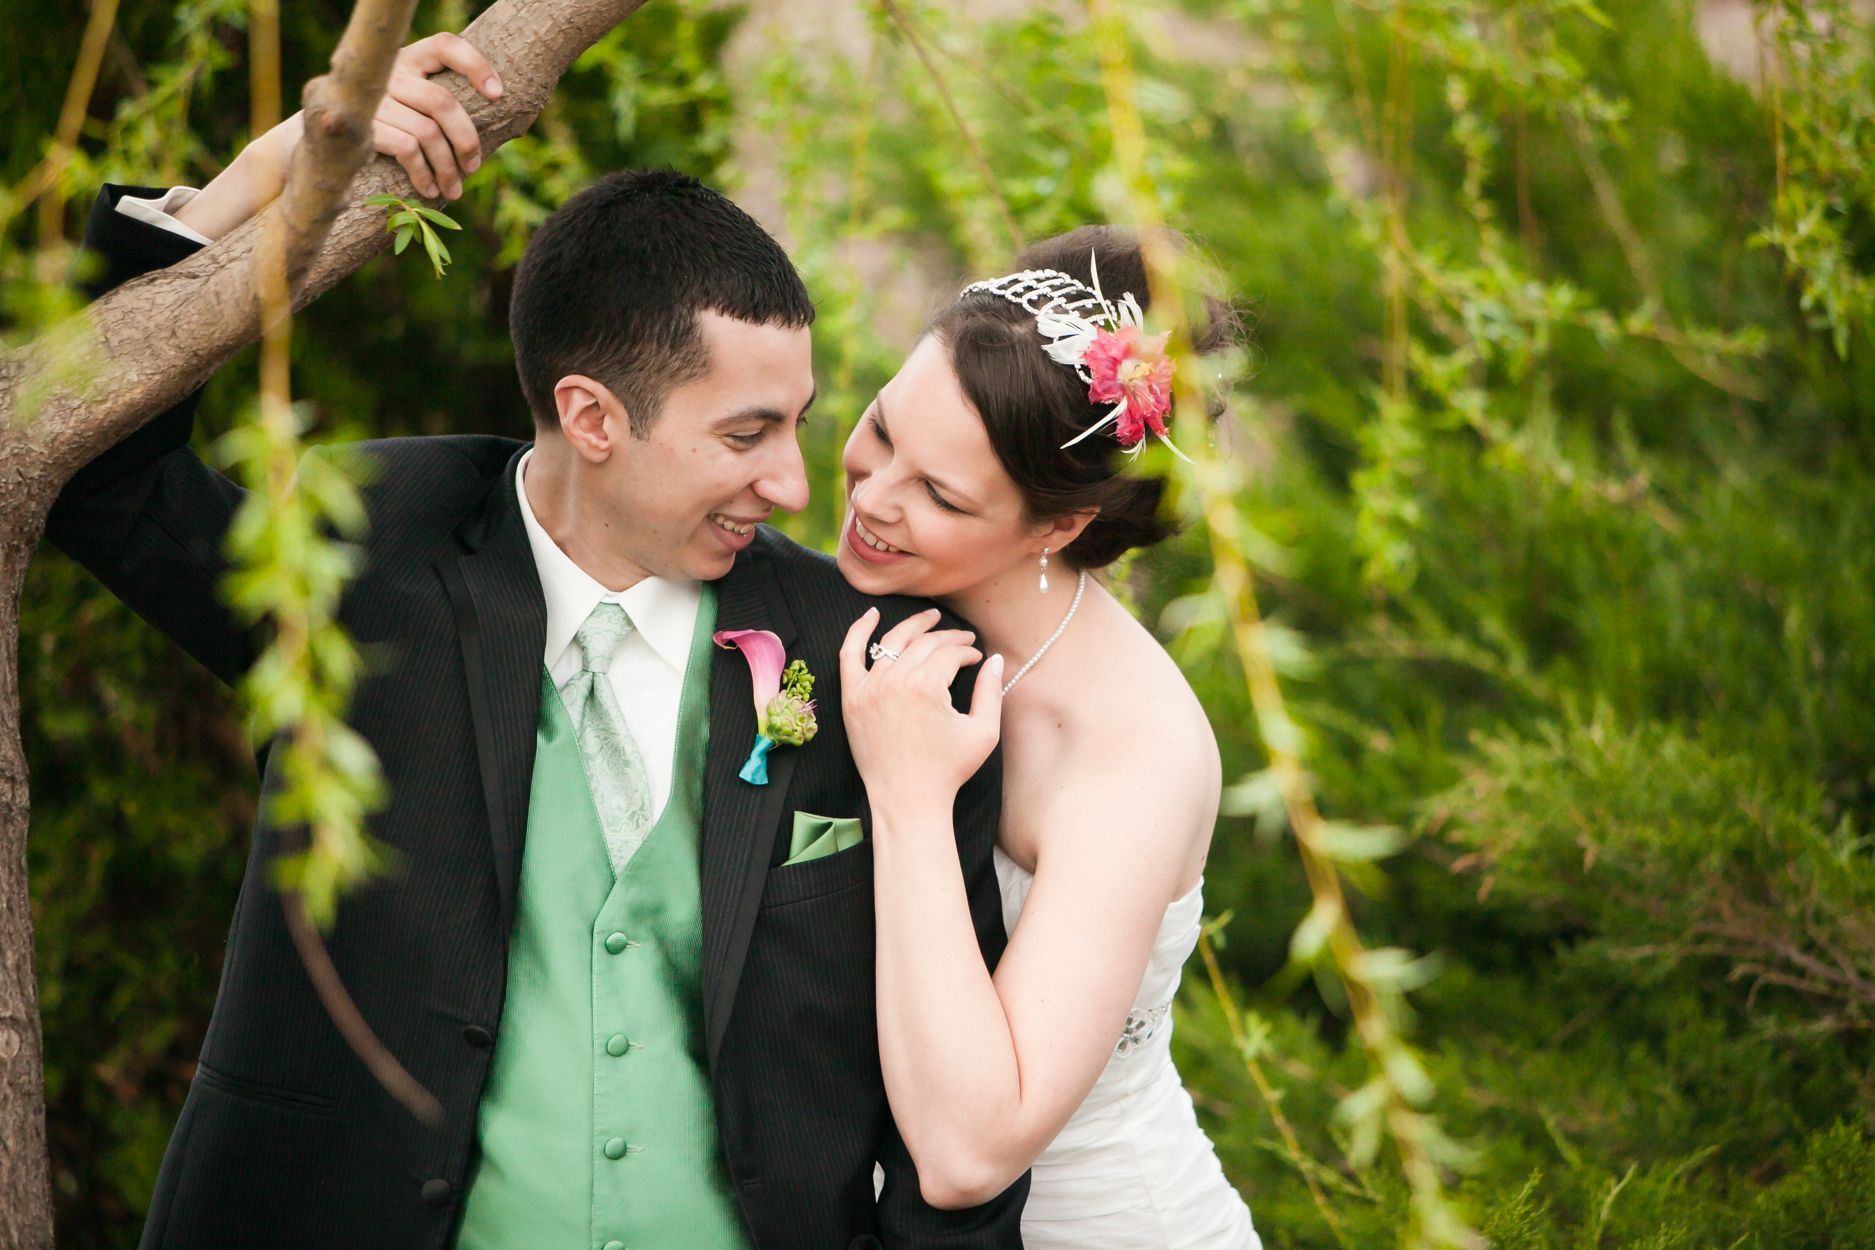 Man Cave Kristan Green : Wedding poses minneapolis photographer 002